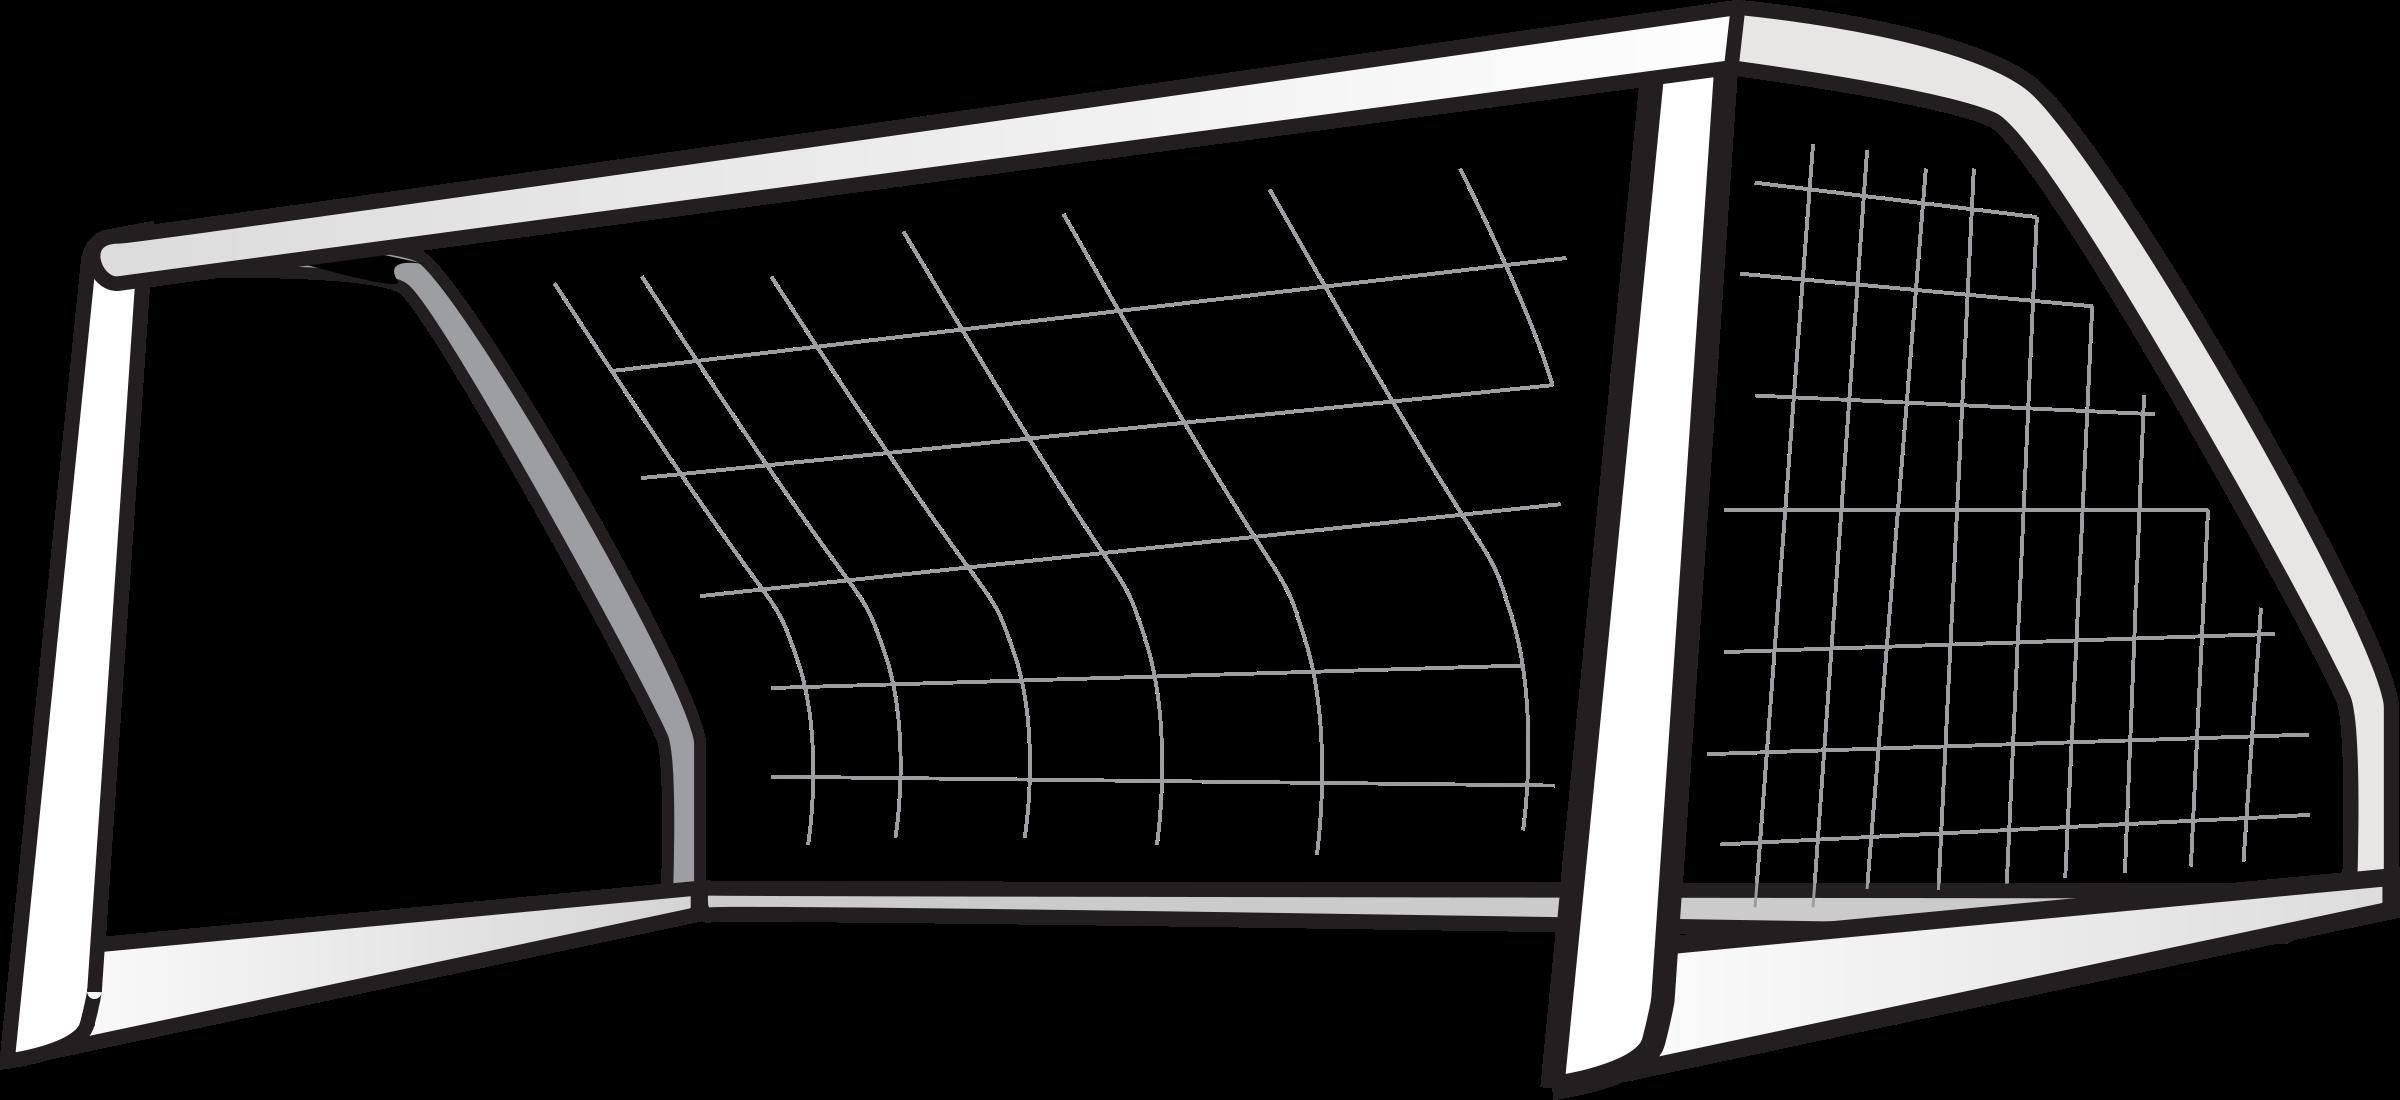 2400x1100 Soccer Net Clip Art Clipartfest Goal Clipart 2